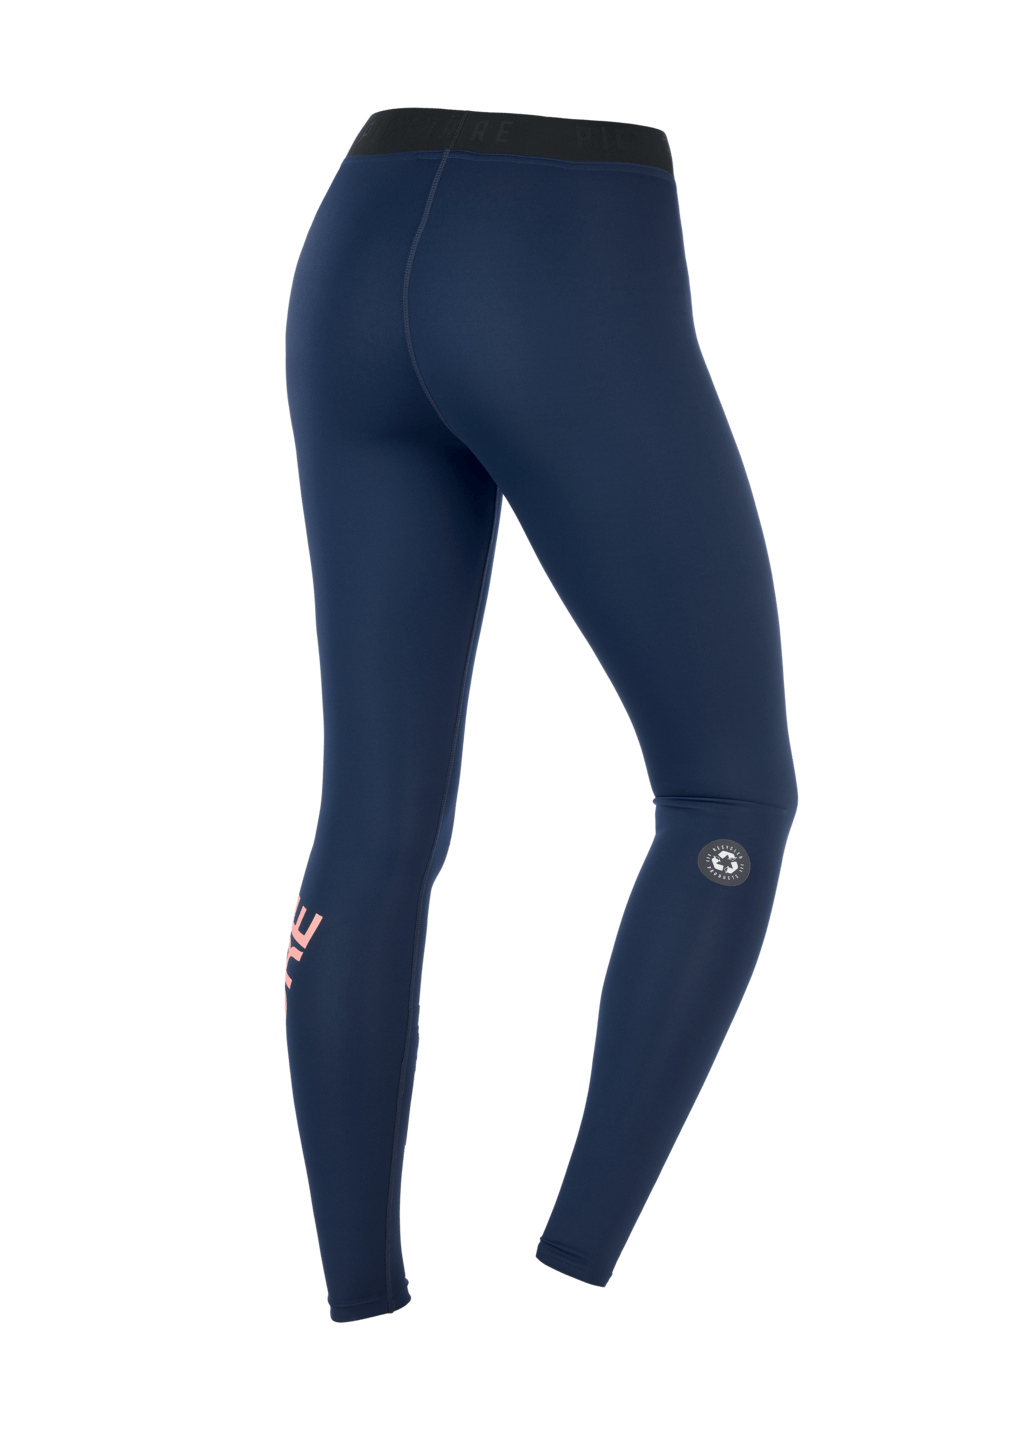 Legging Femme Picture Caty Dark Blue